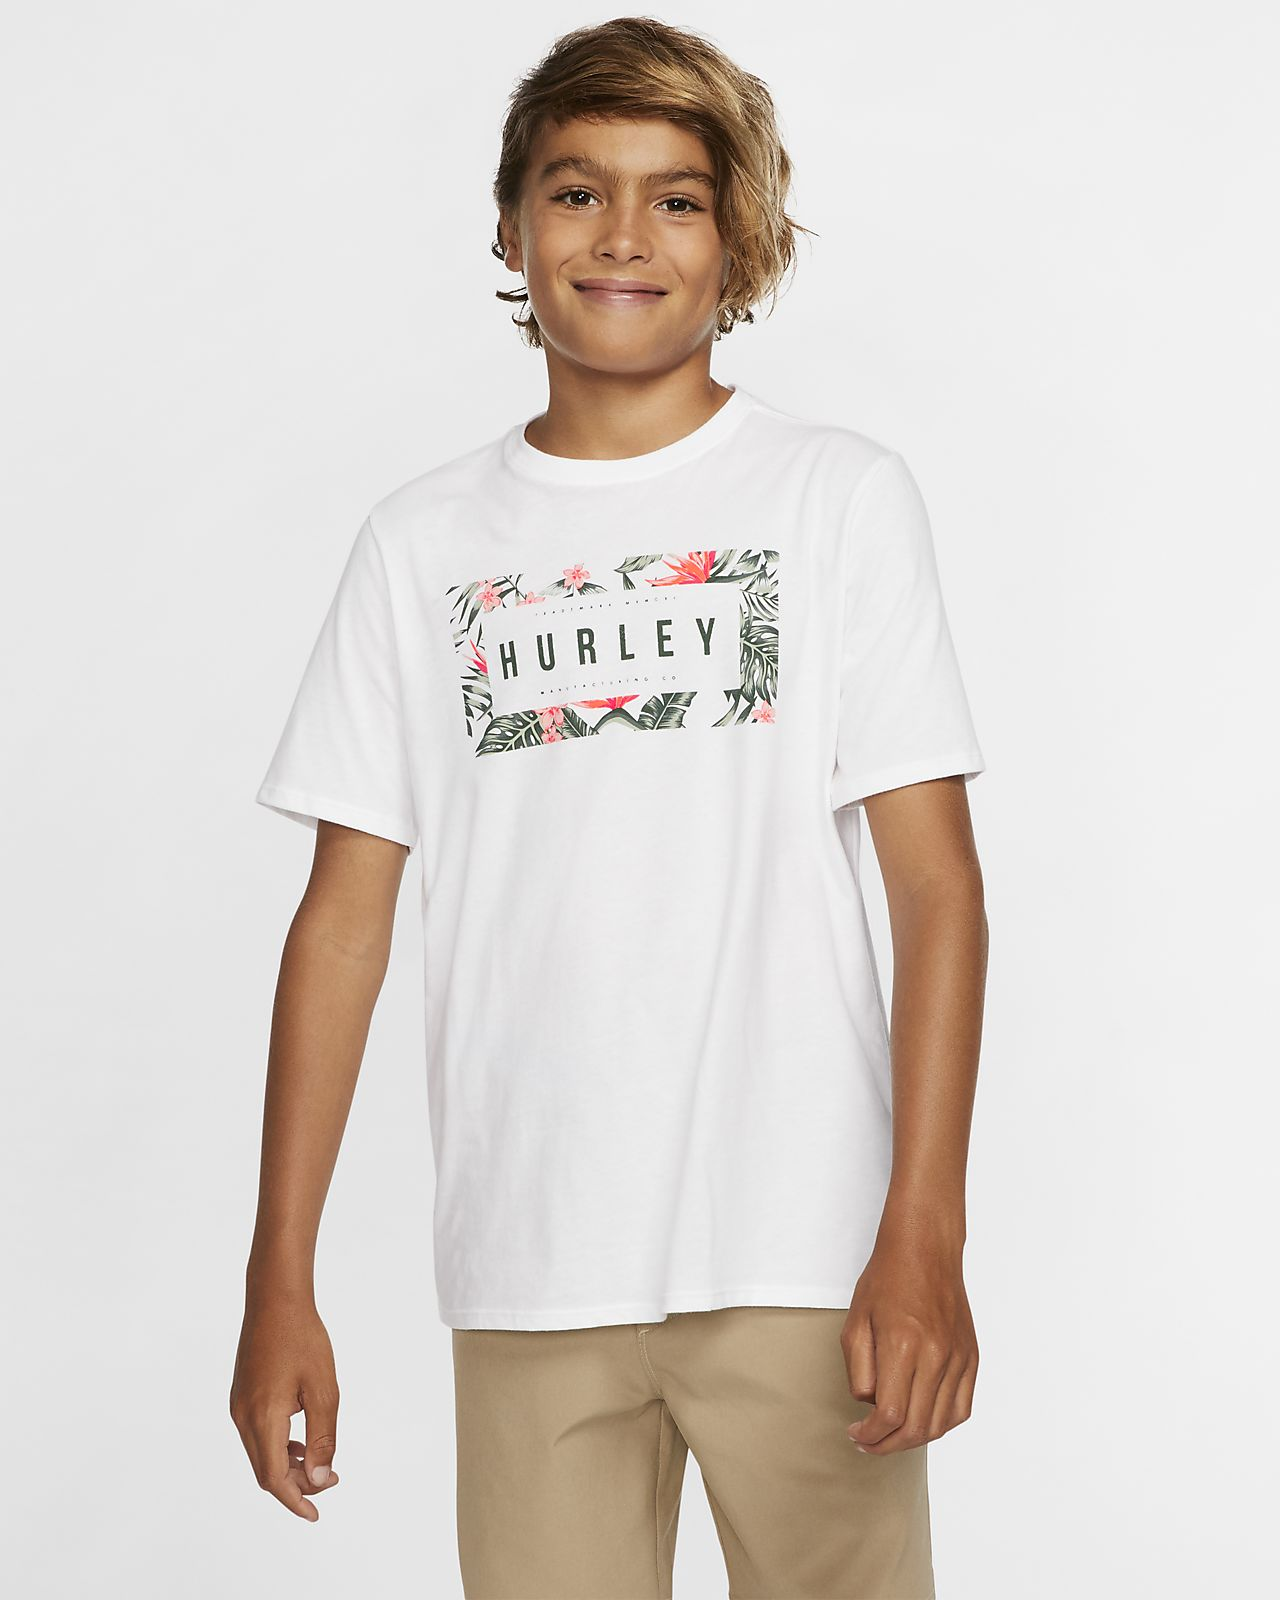 Playera para niño Hurley Premium Flashback Floral